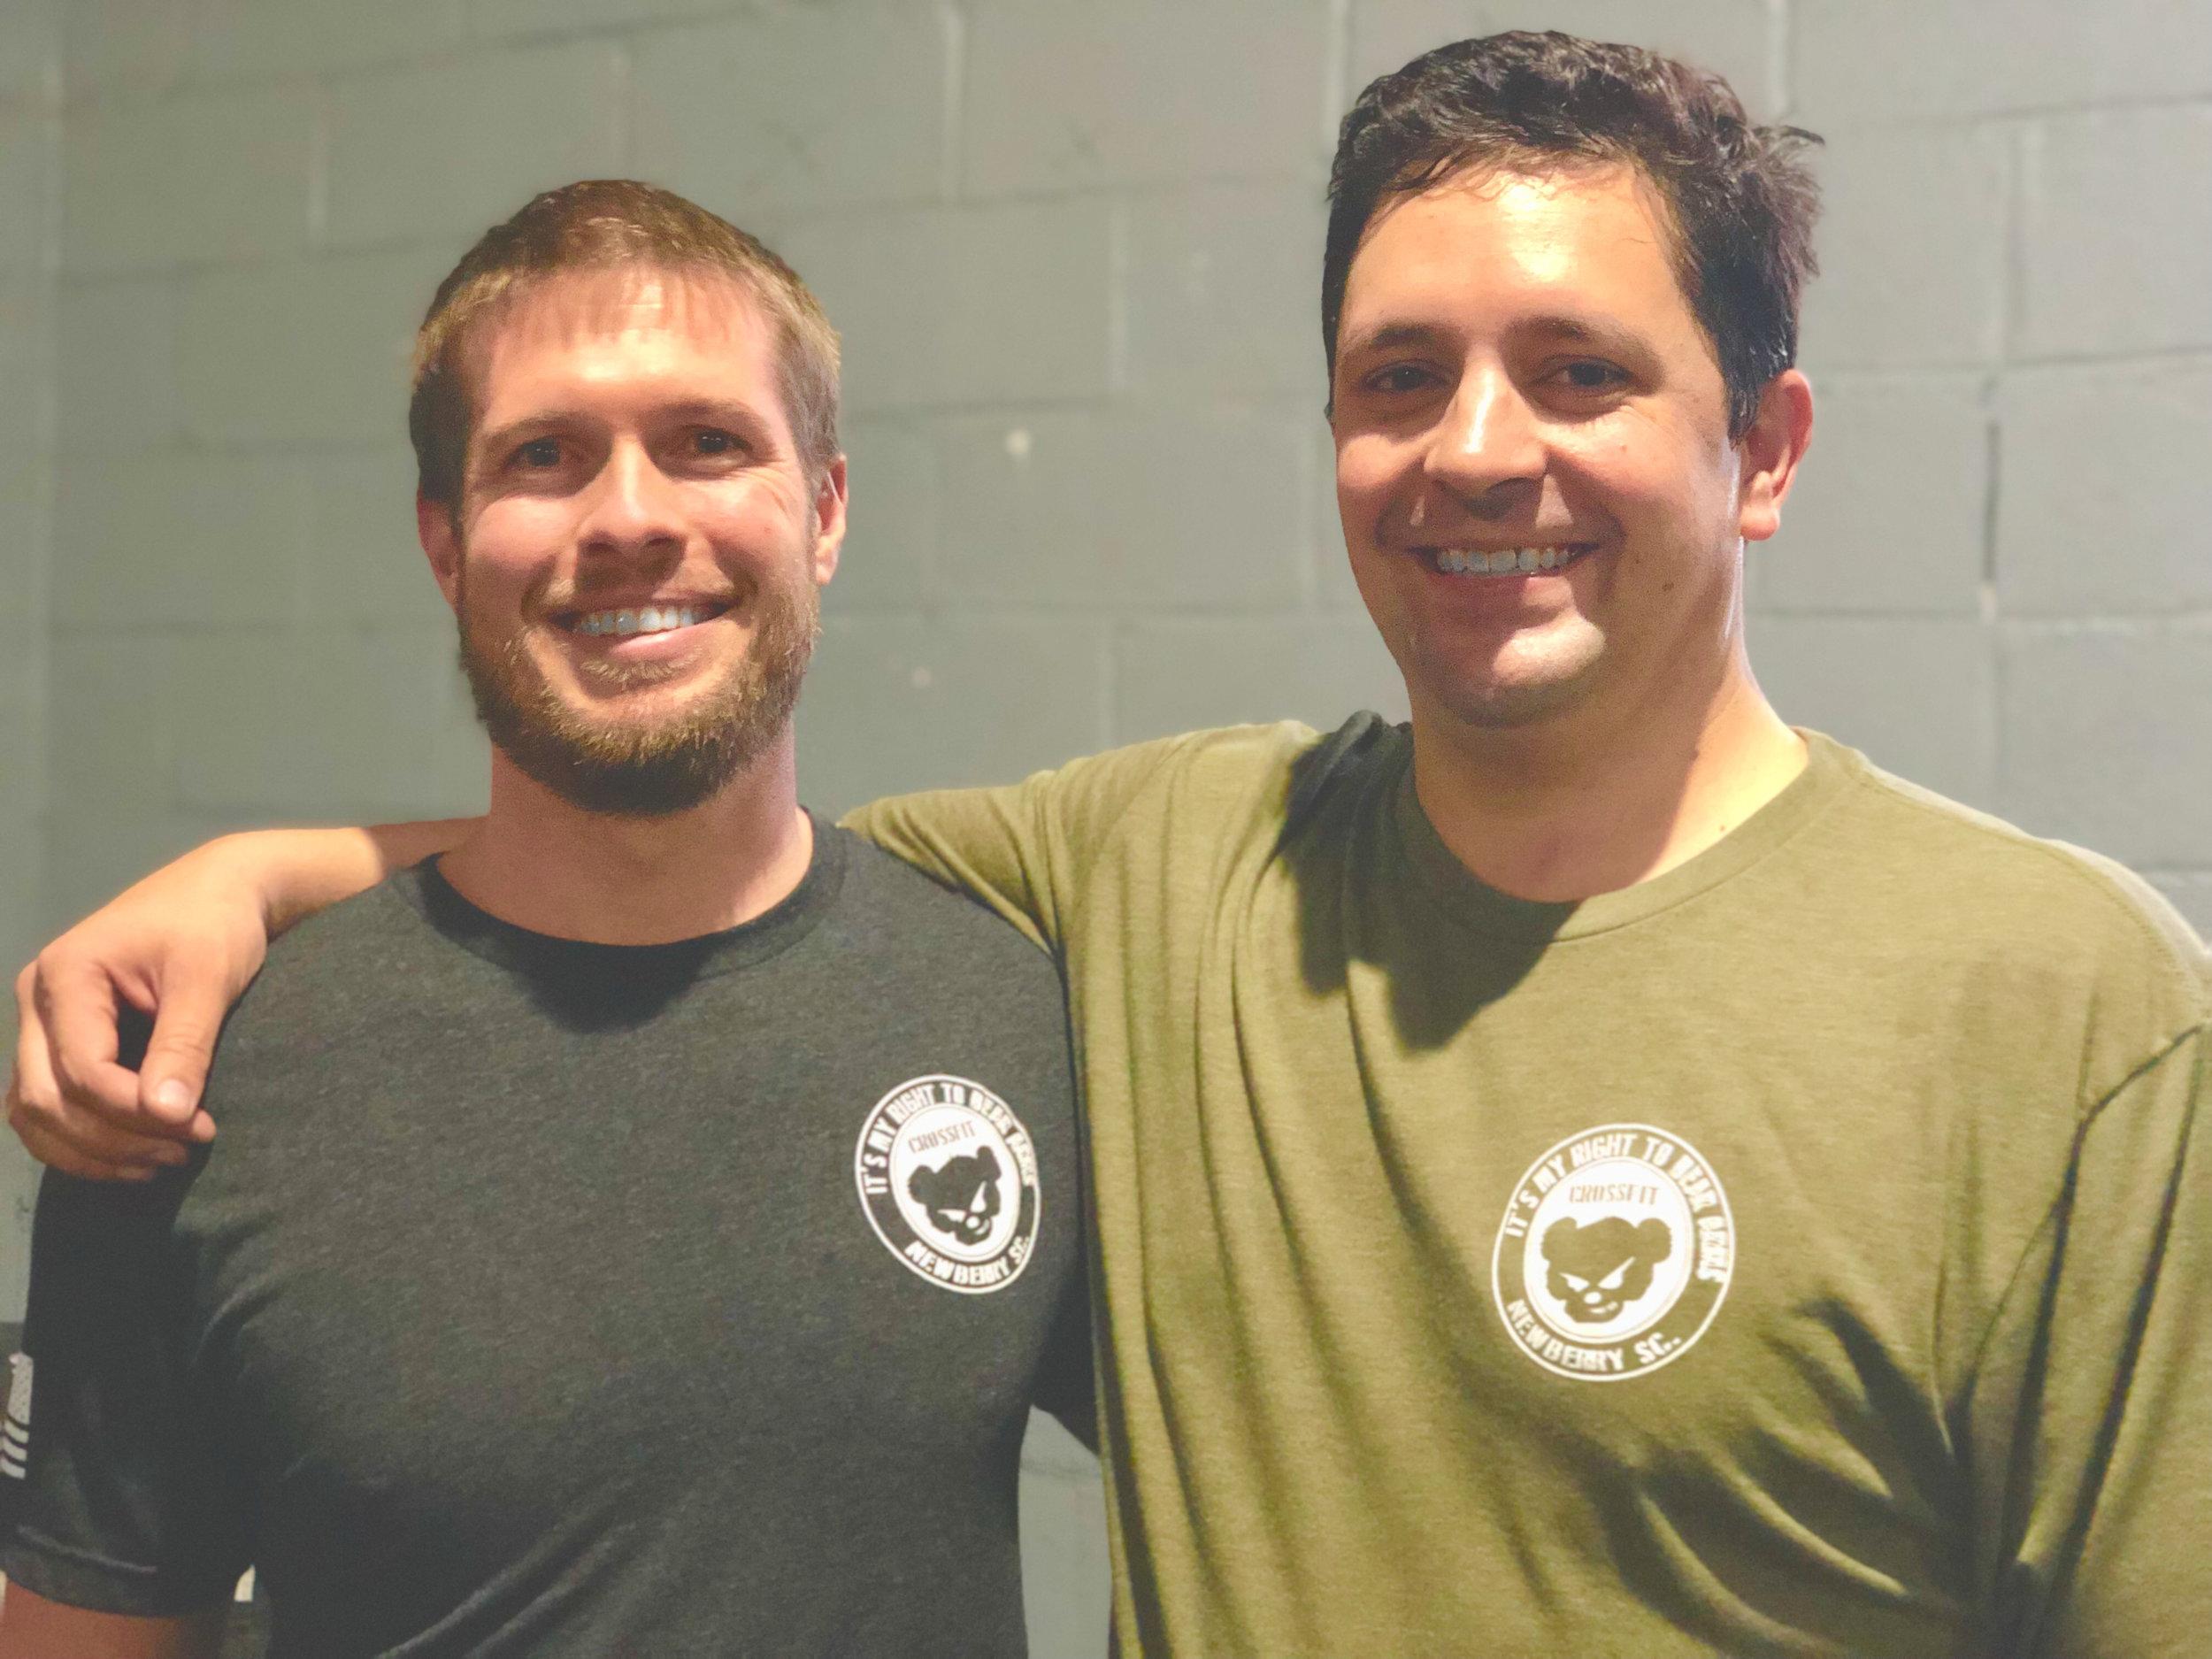 Ryan Smith and Pastor Matthew Titus at Bear Arms Crossfit